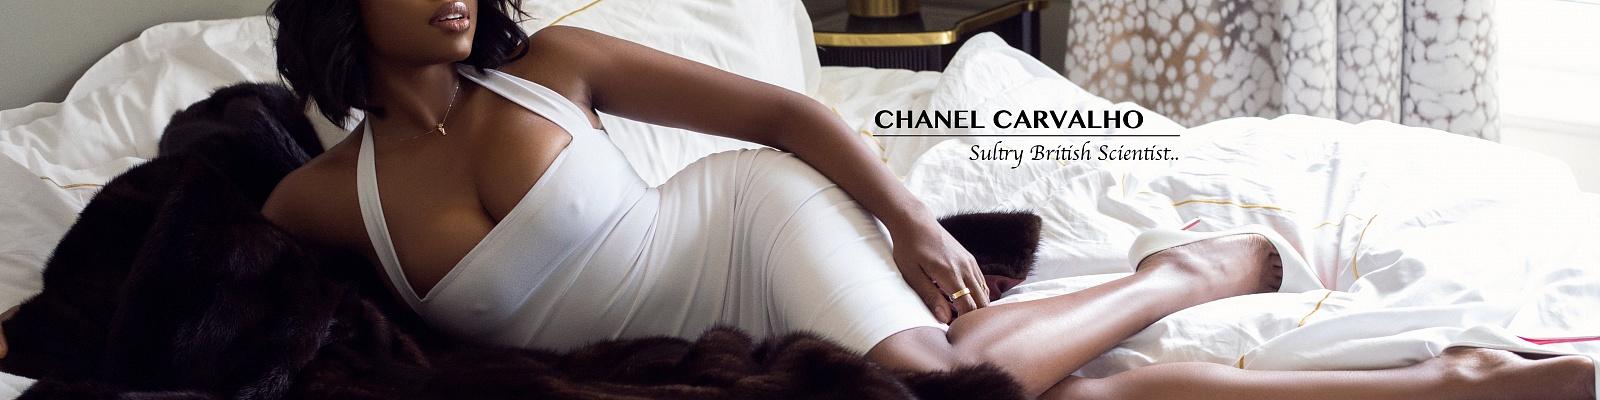 Chanel Carvalho Escort